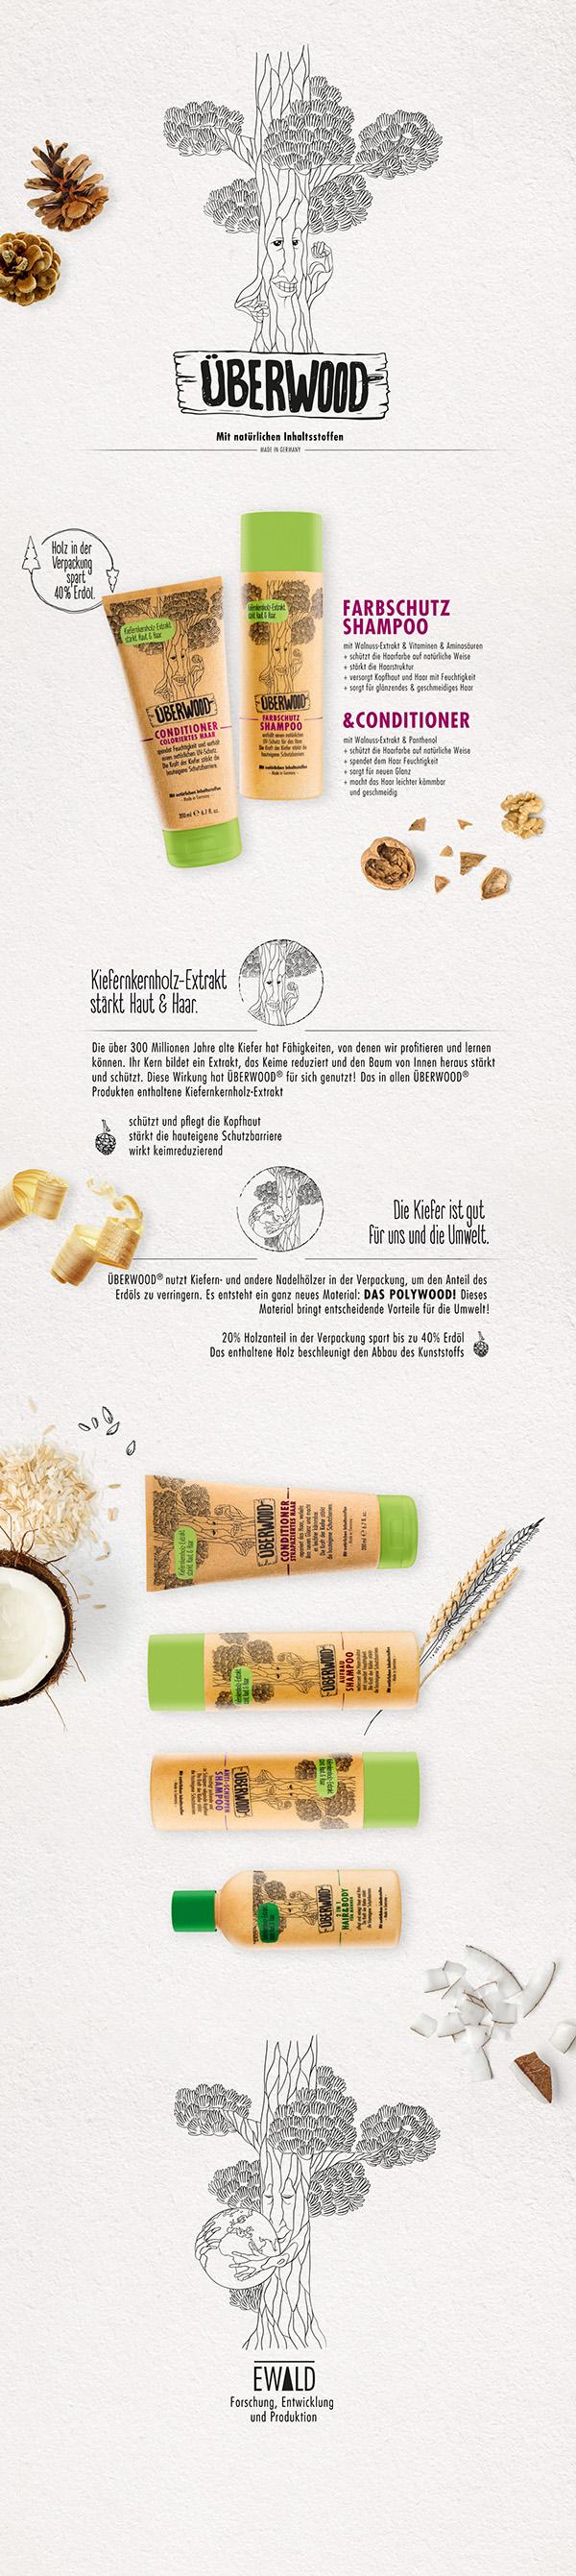 Package Design - ÜBERWOOD Hair Care on Behance